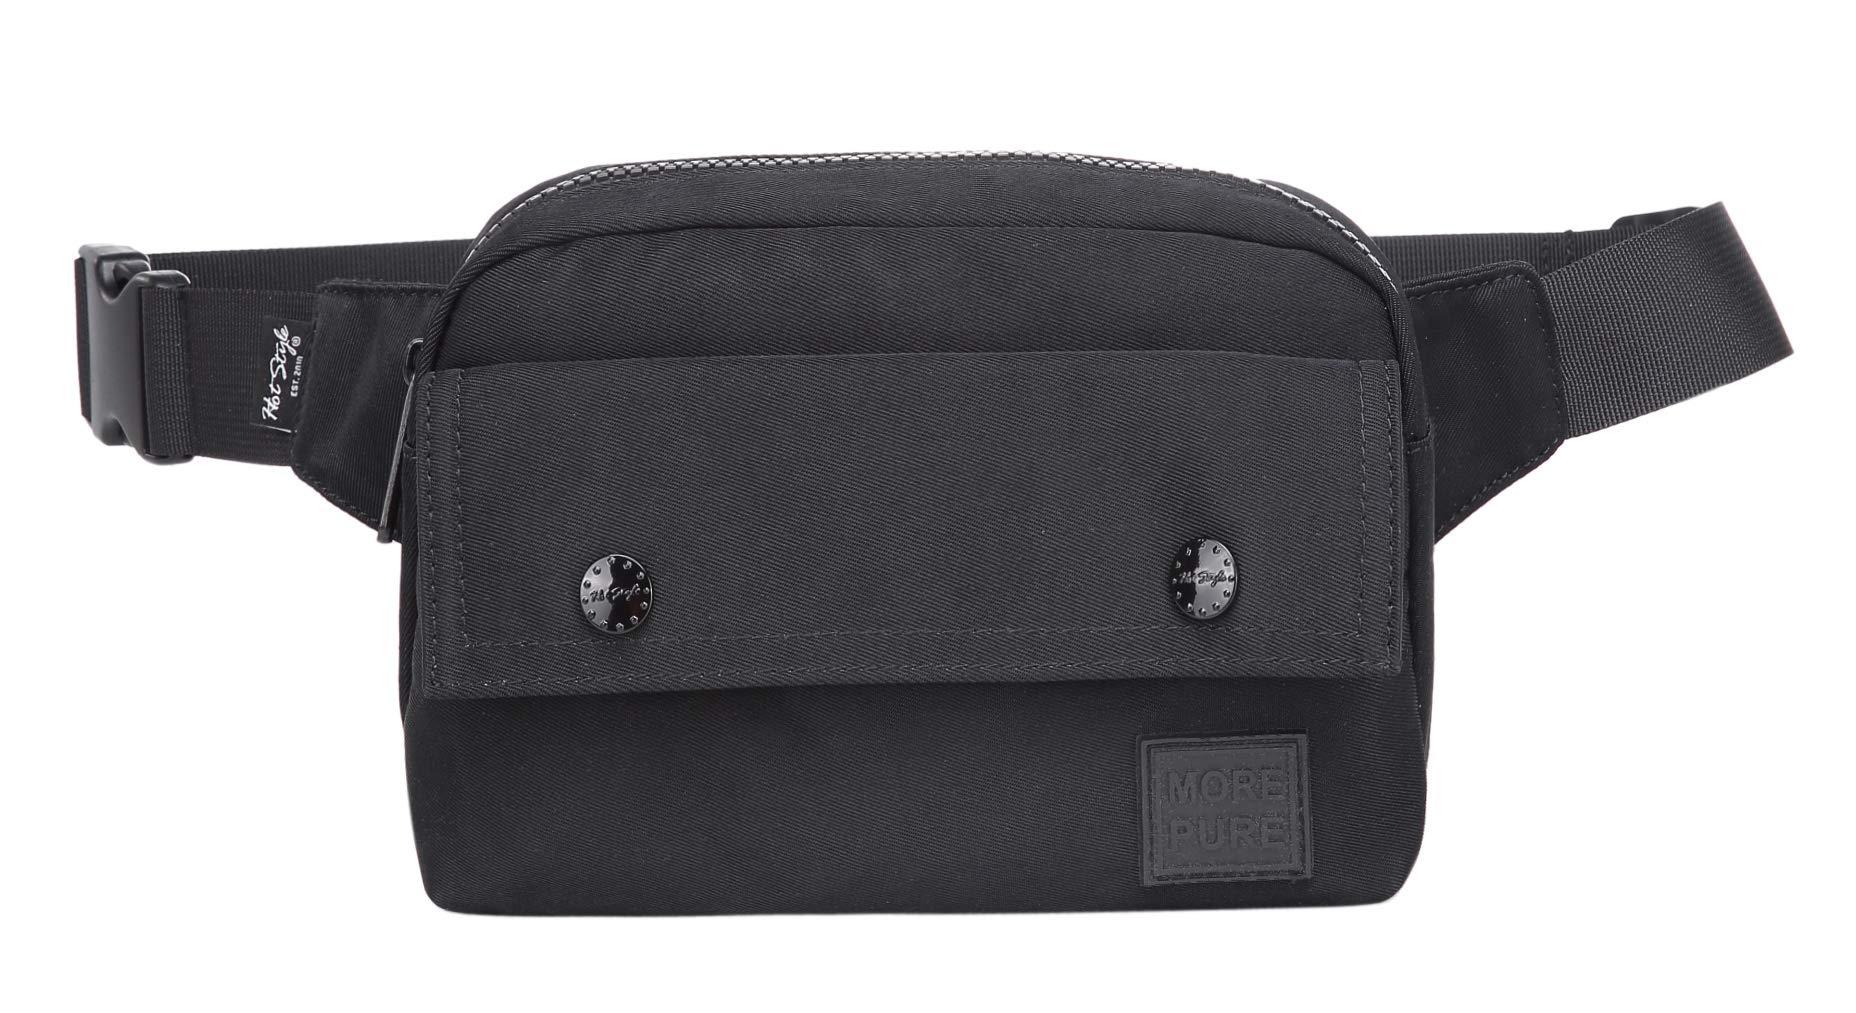 MORE PURE 533s Cute Fanny Pack Classic Waist Bag, Black